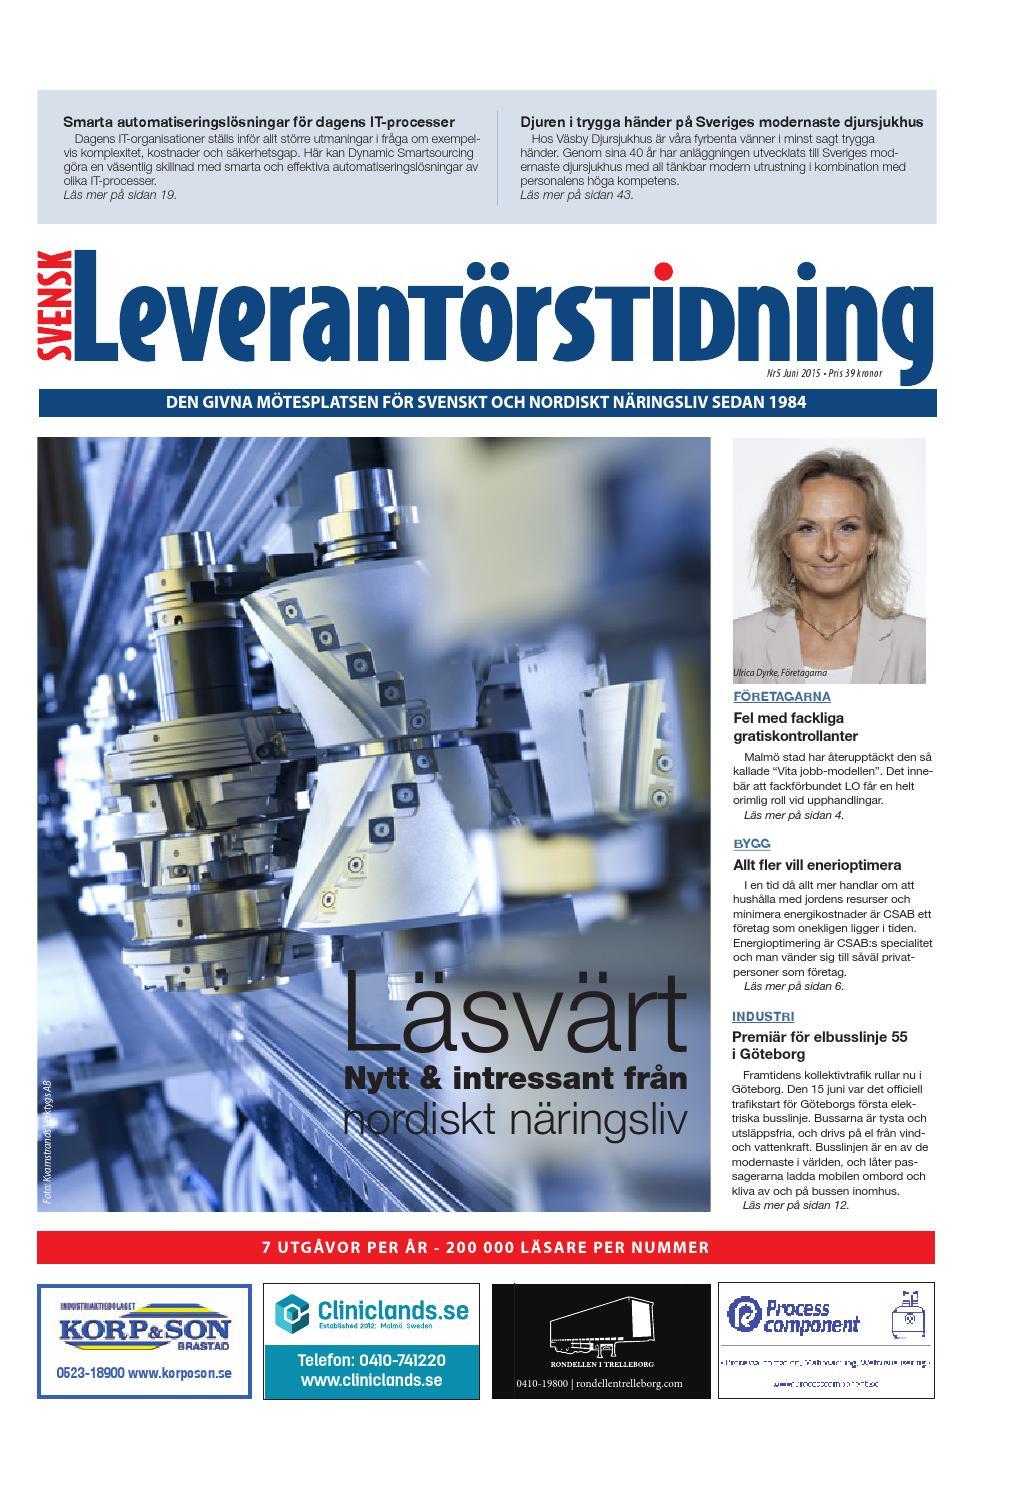 Svensk Leverantörstidning nr-5 2015 by Hexanova Media Group AB - issuu d97f4aa09a947